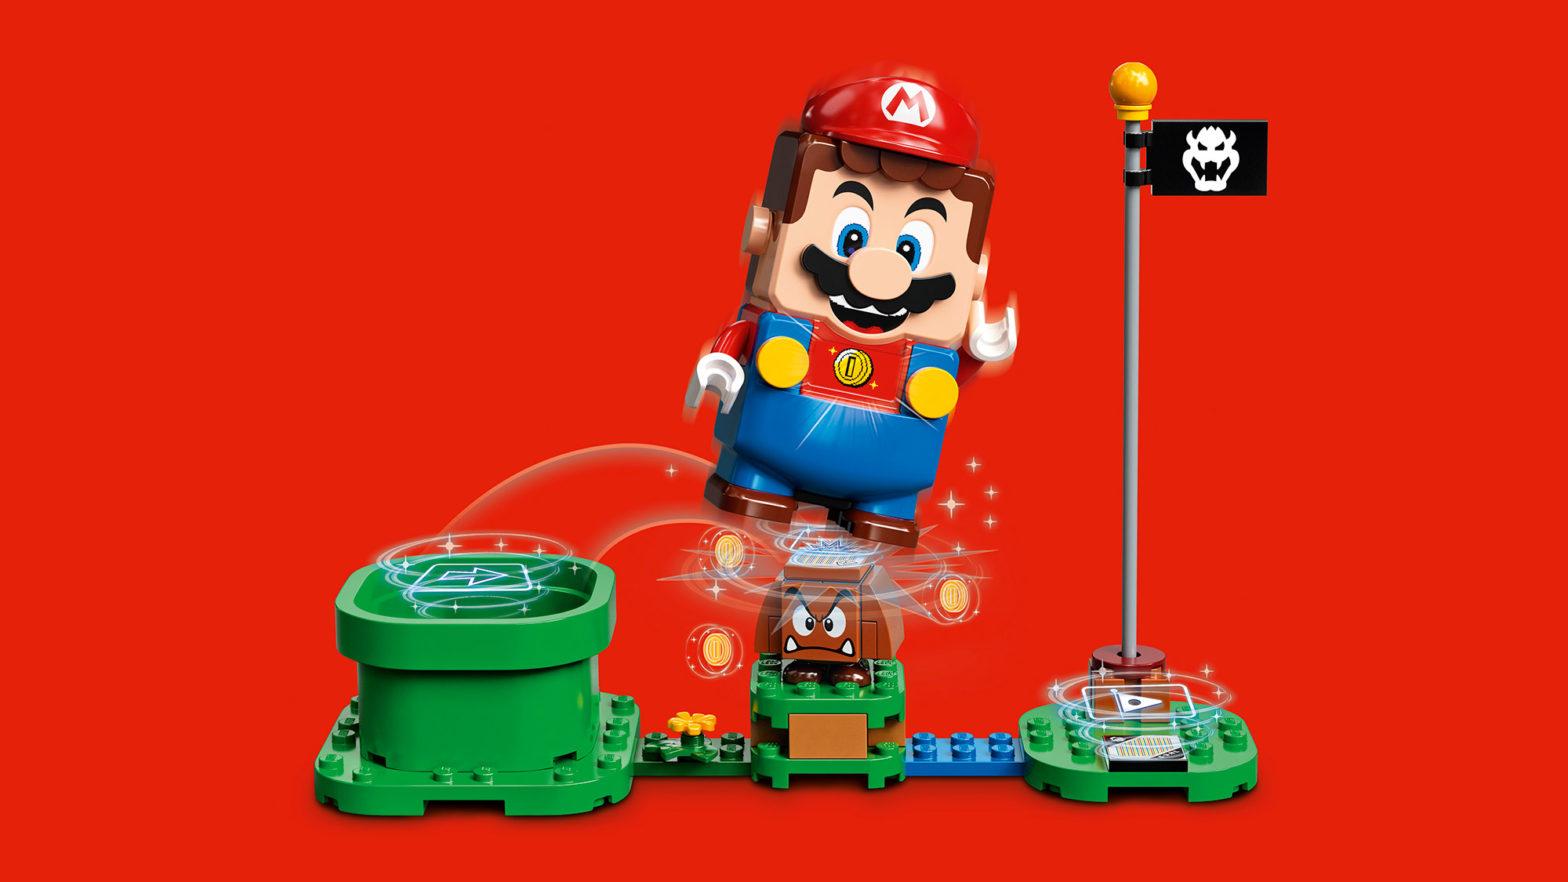 LEGO Super Mario Play Experience